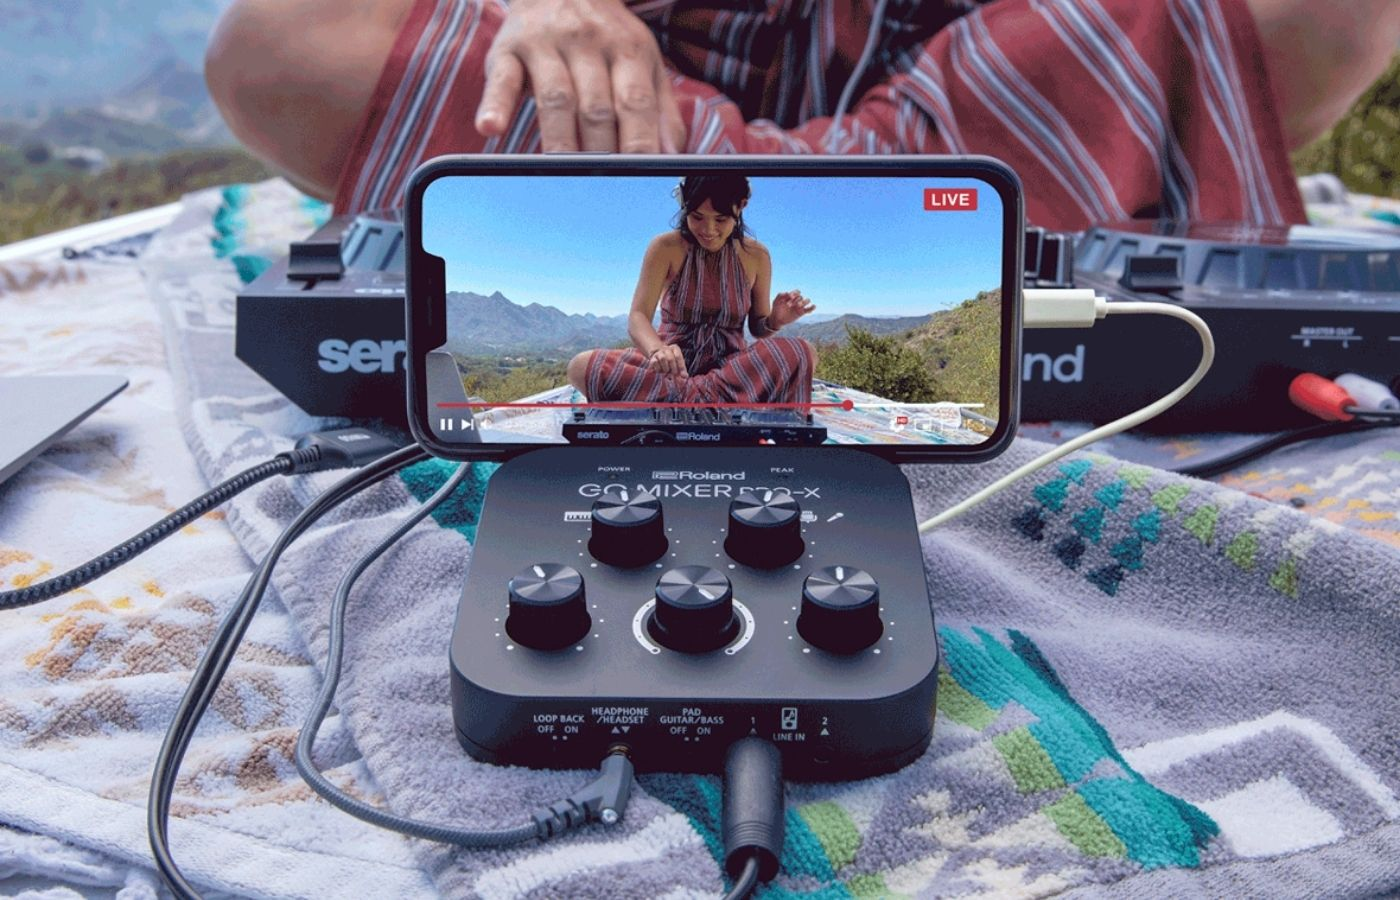 Roland lanza un nuevo mixer portátil para transmitir desde tu teléfono